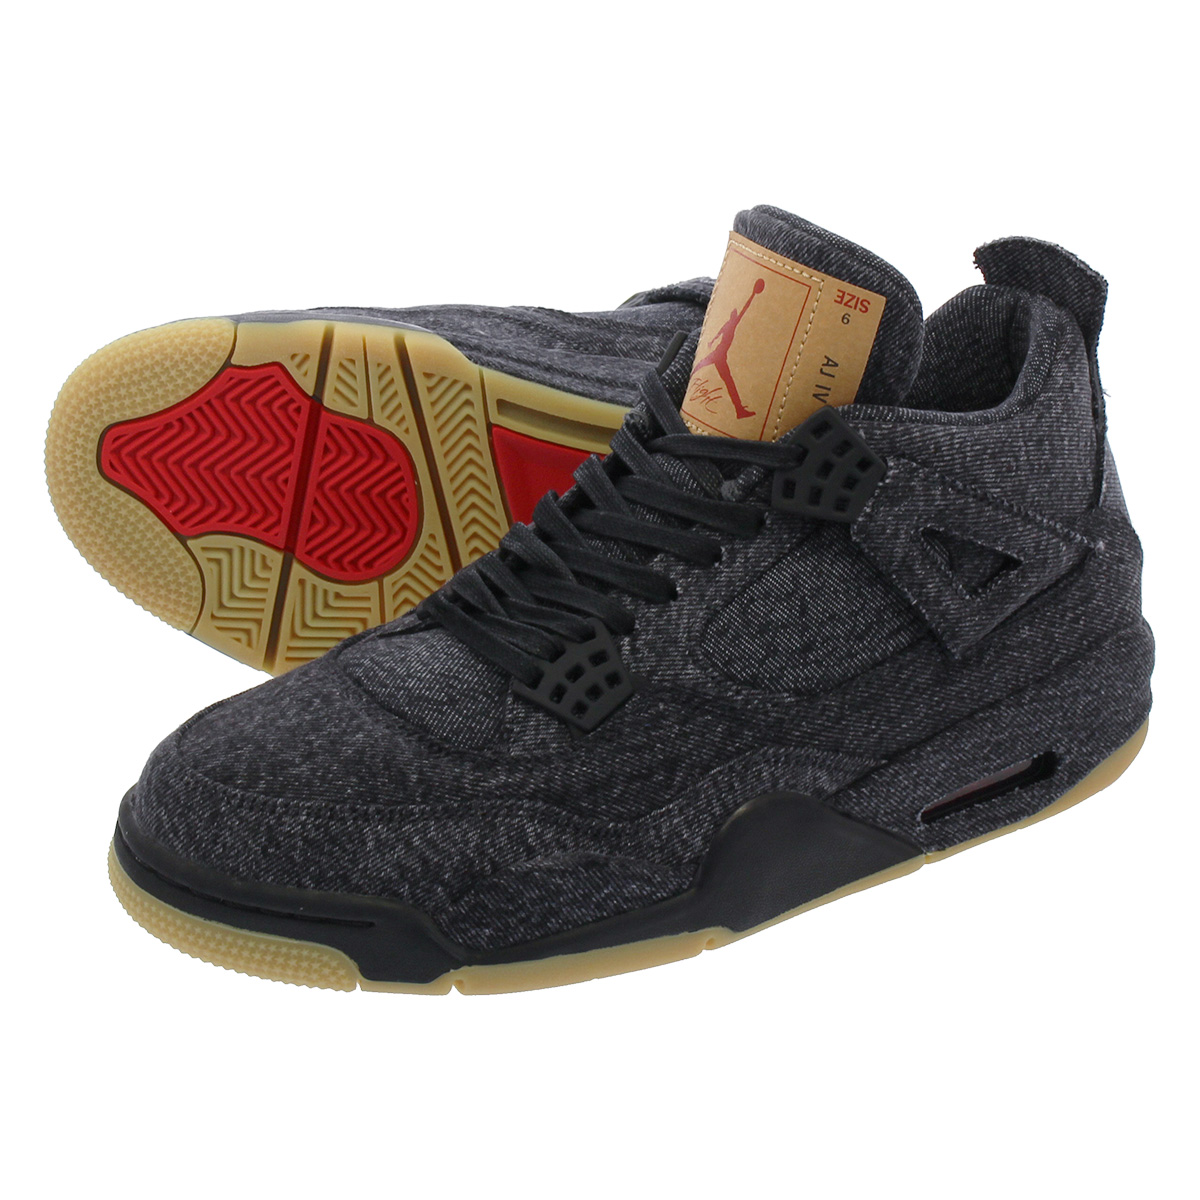 low priced d21df 6f1d6 NIKE AIR JORDAN 4 RETRO NRG Nike air Jordan 4 nostalgic NRG Levis  BLACK/BLACK ao2571-001